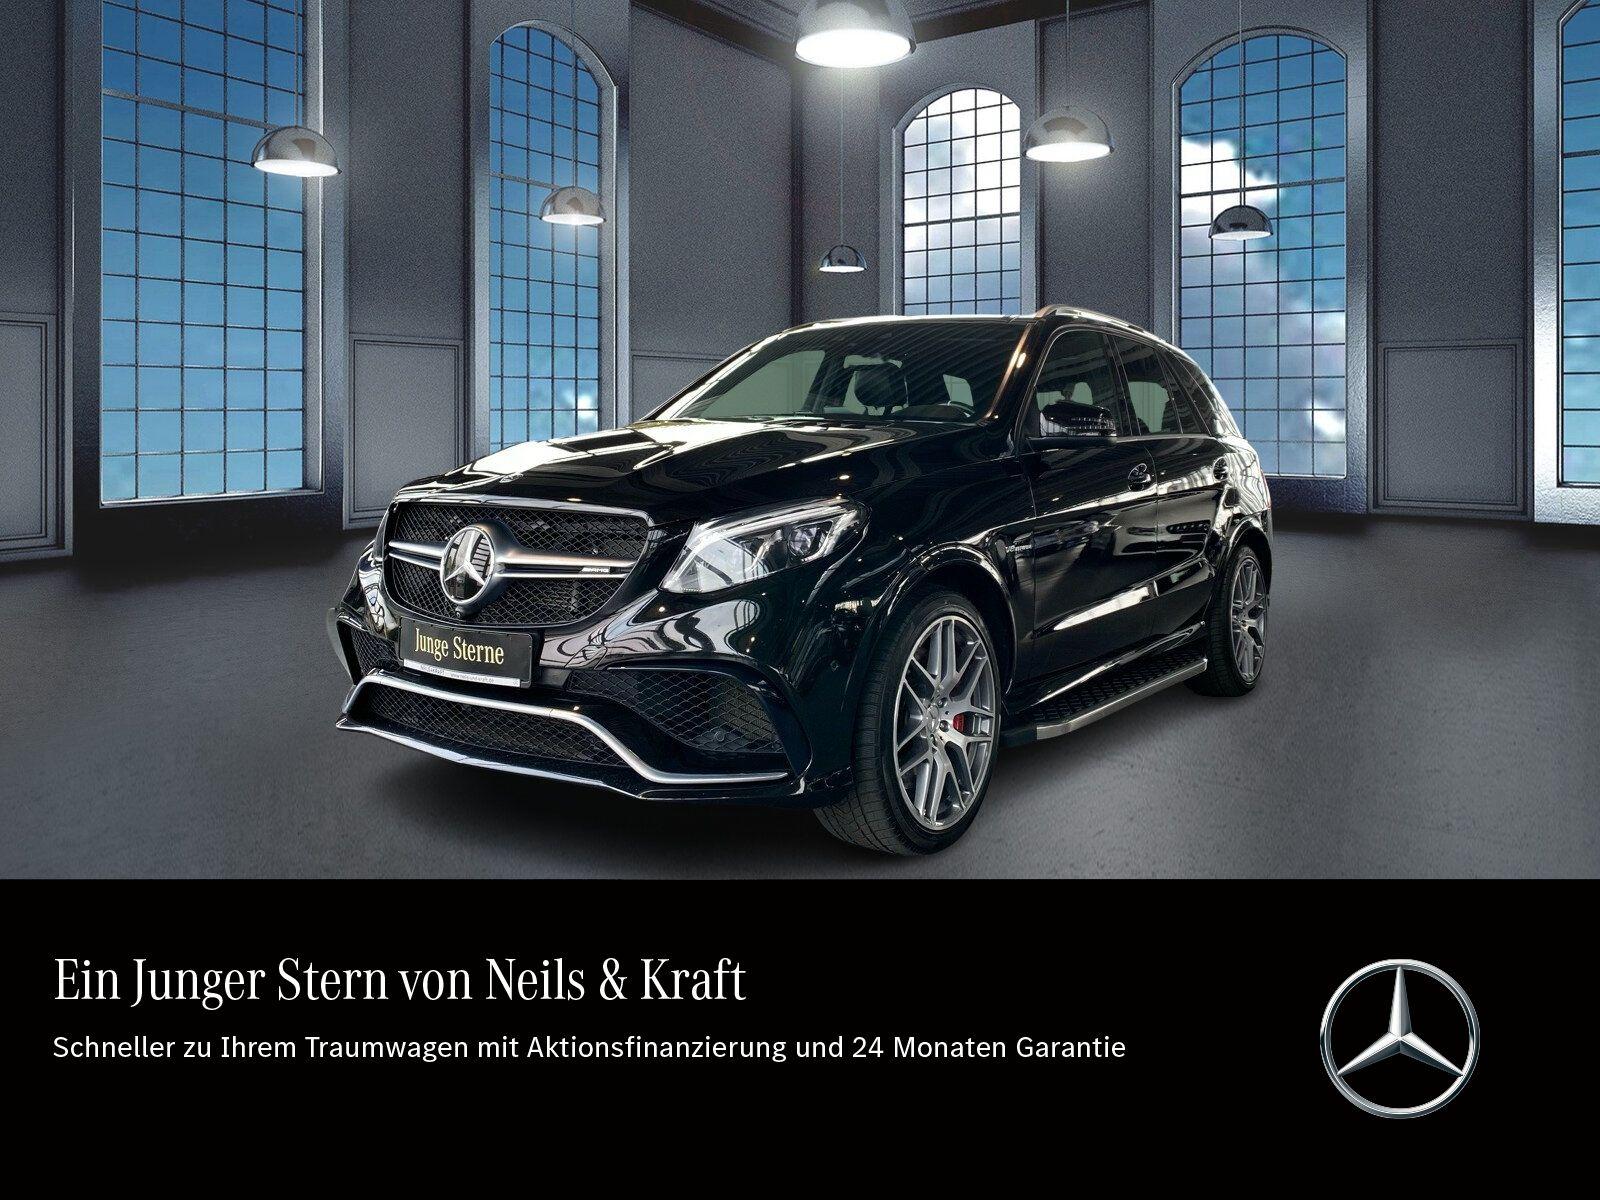 Mercedes-Benz AMG GLE 63 S 4MATIC Sitzklima+Drivers P.+Comand, Jahr 2018, Benzin